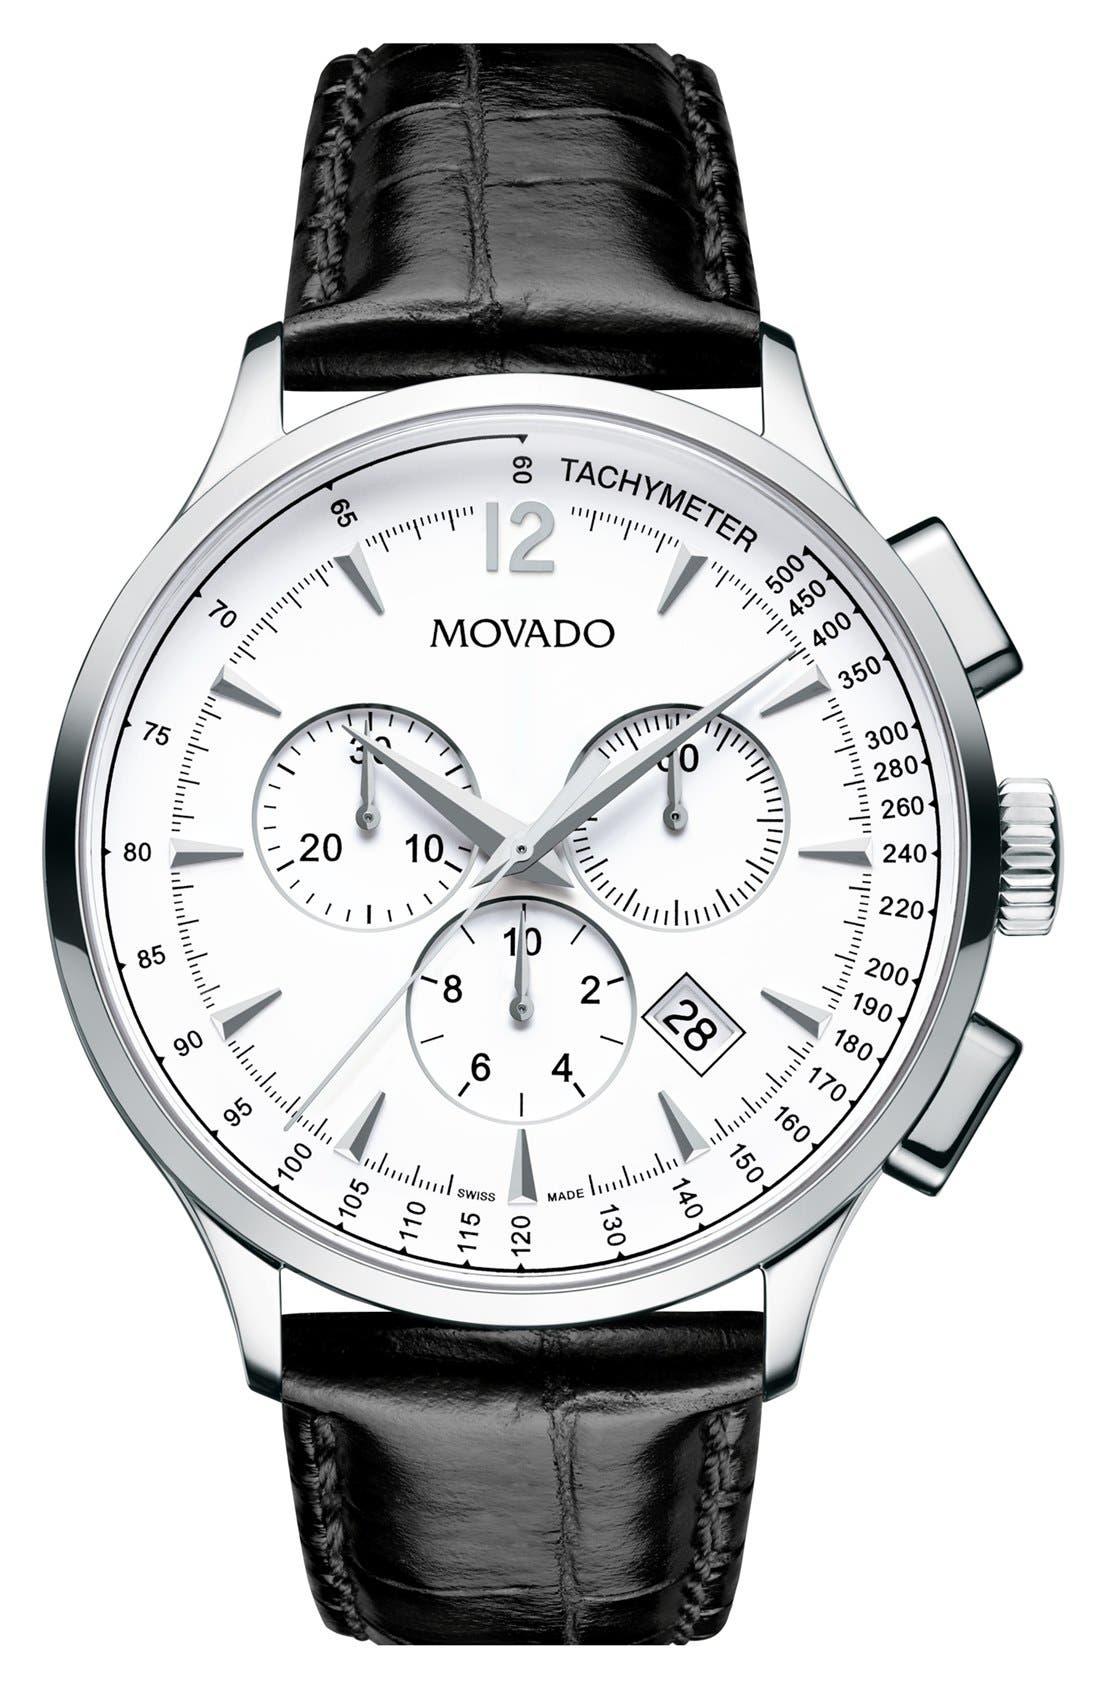 Main Image - Movado 'Circa' Round Chronograph Watch, 42mm